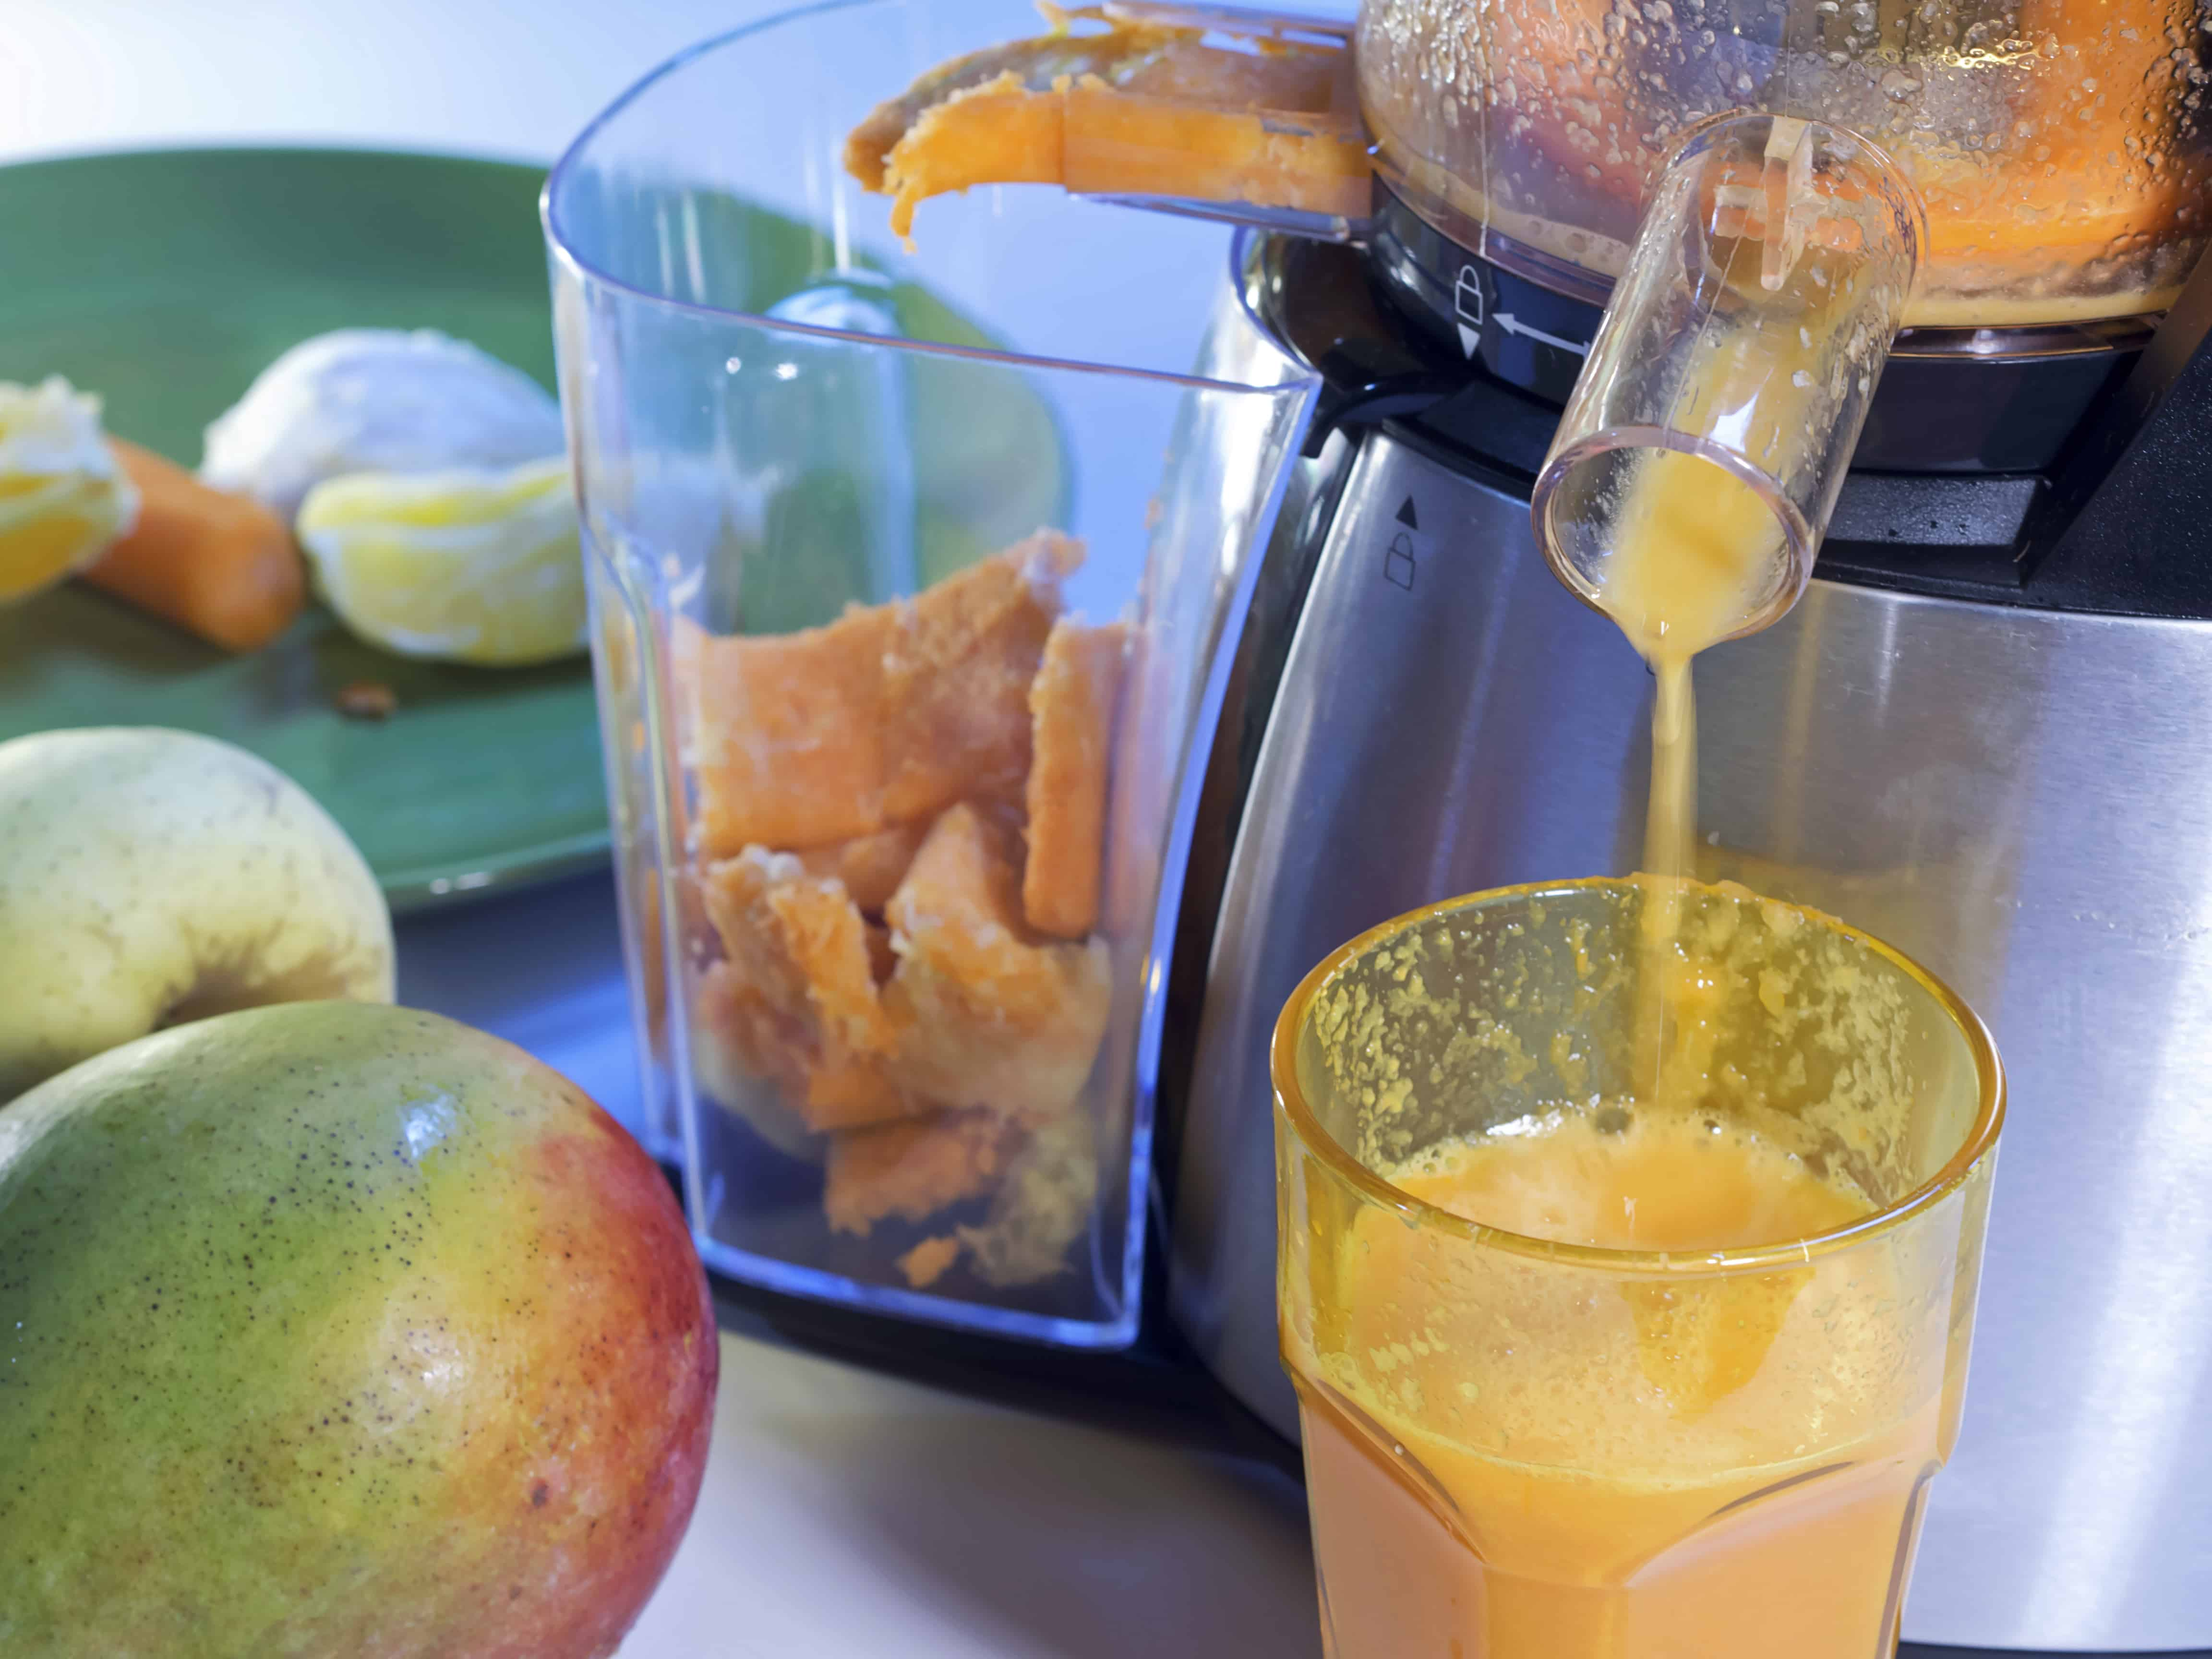 Masticating juicer extracting juice